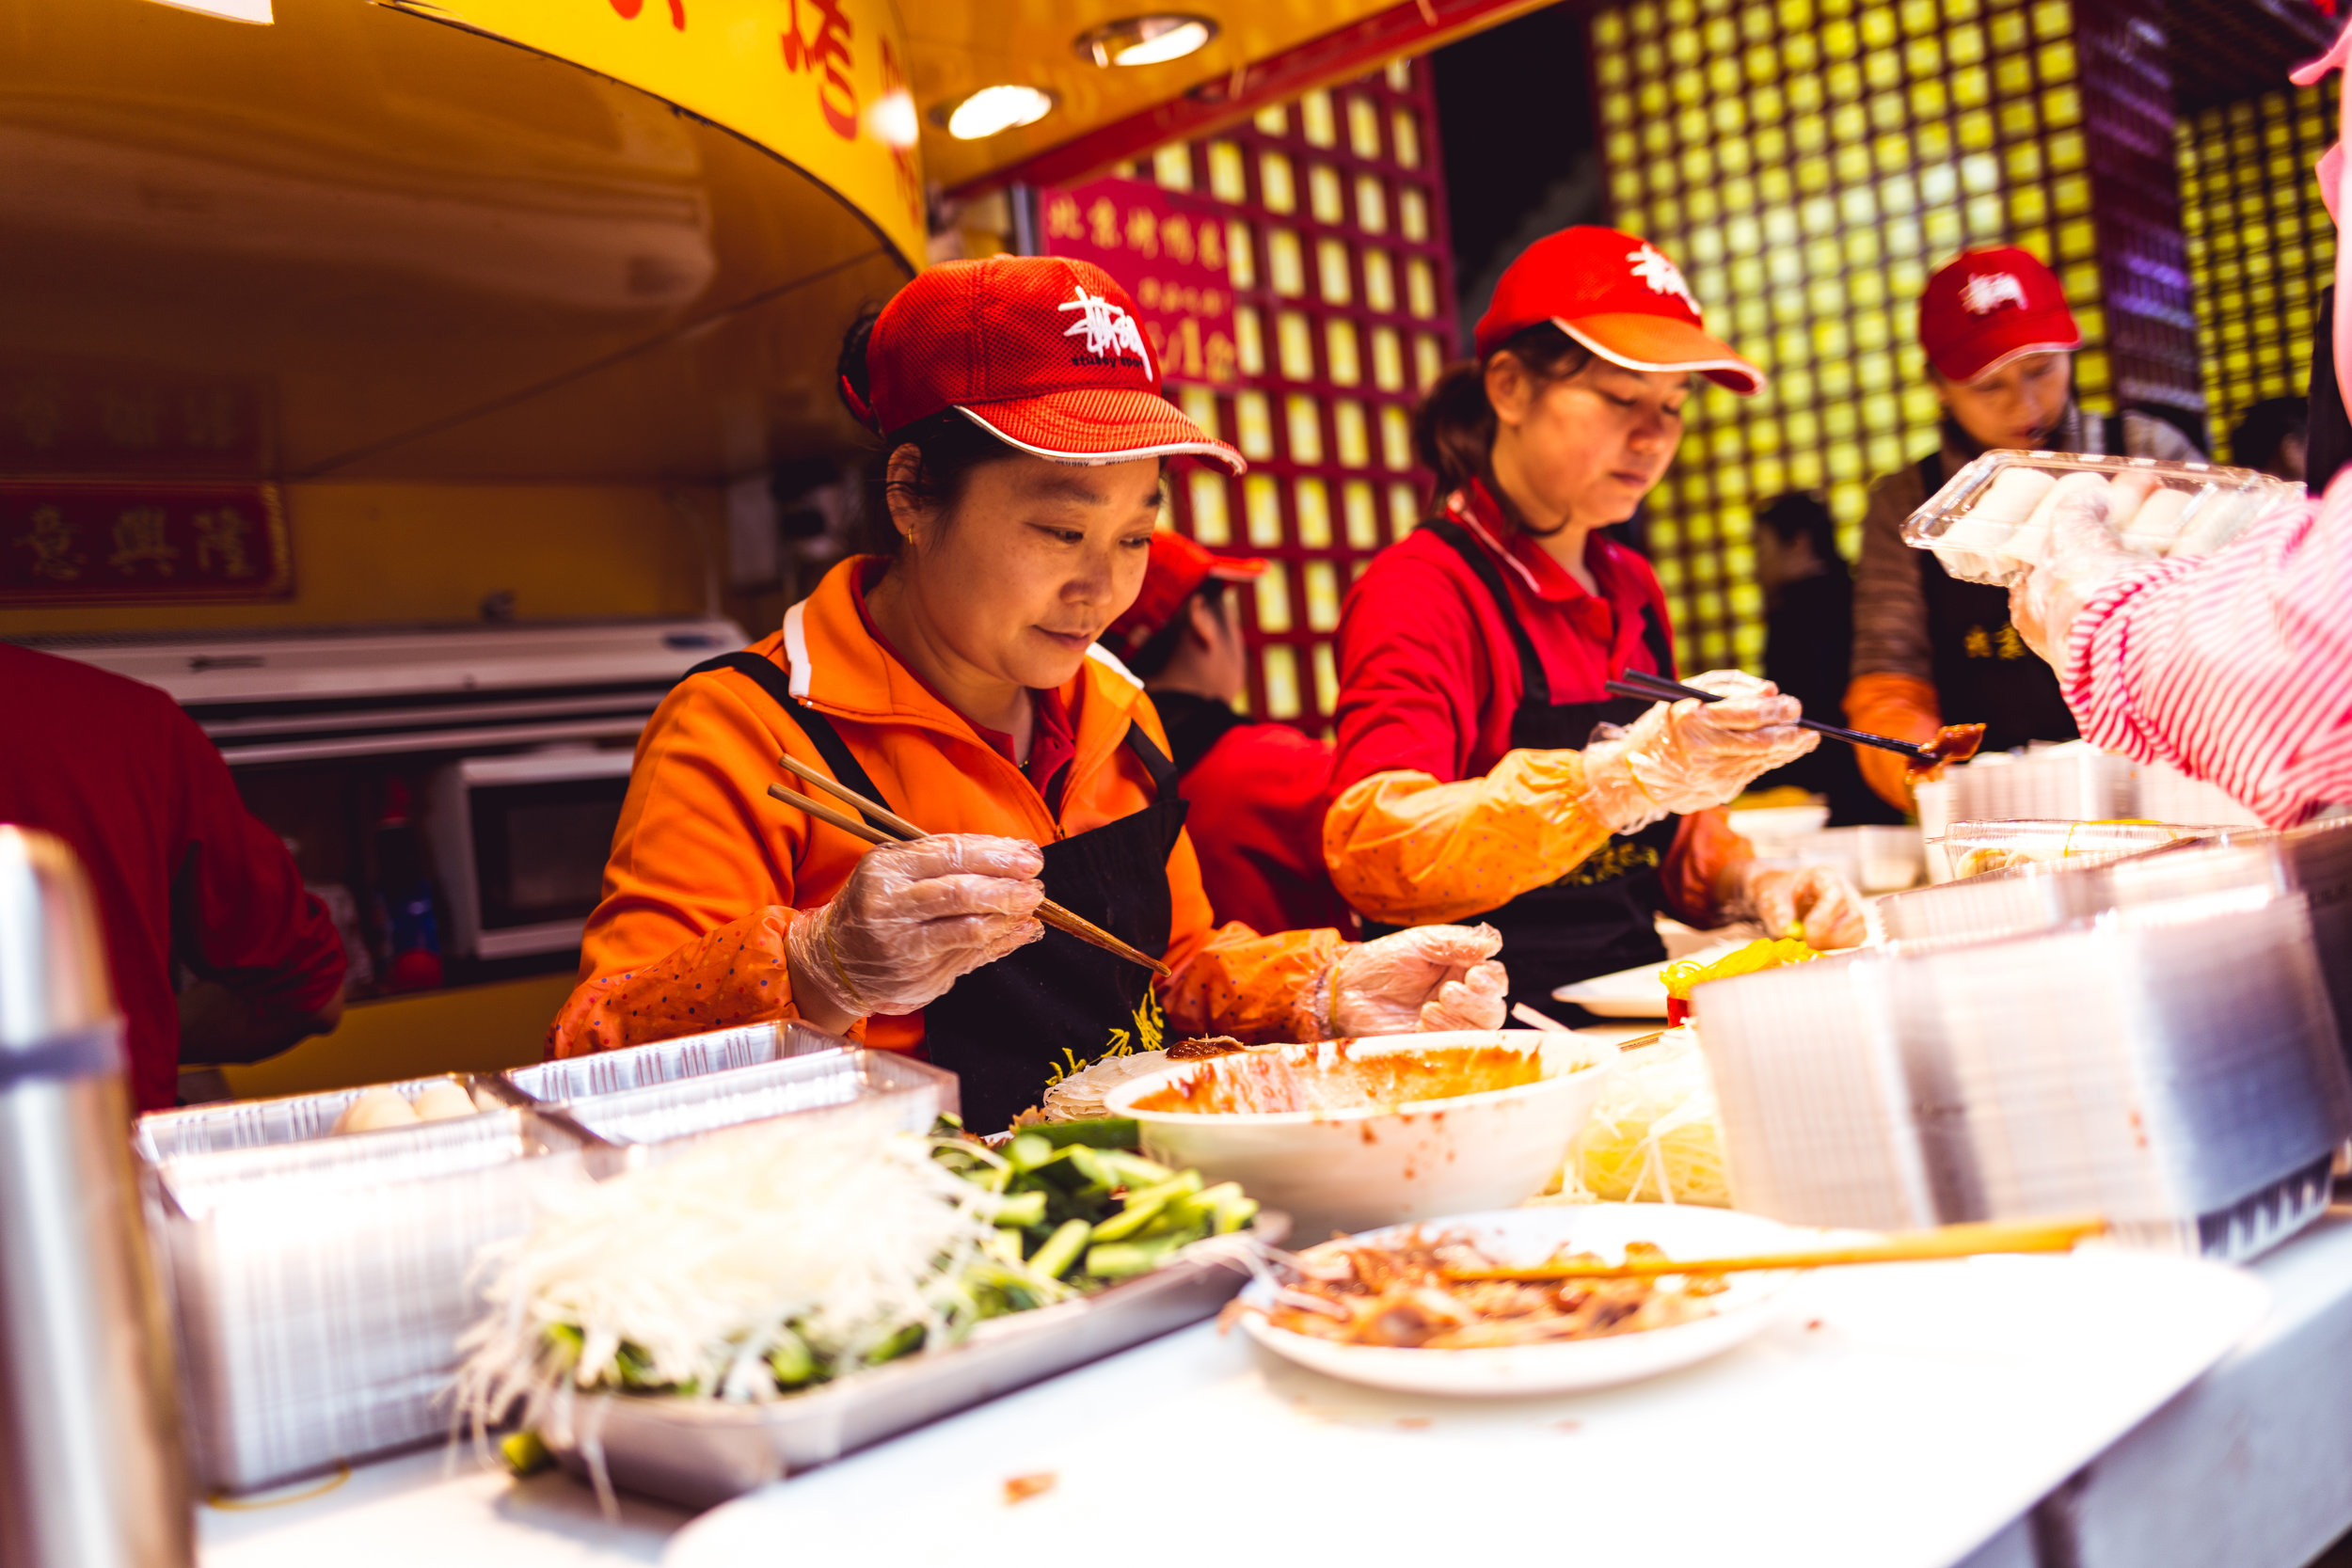 Street food, Shenzhen - January 2018